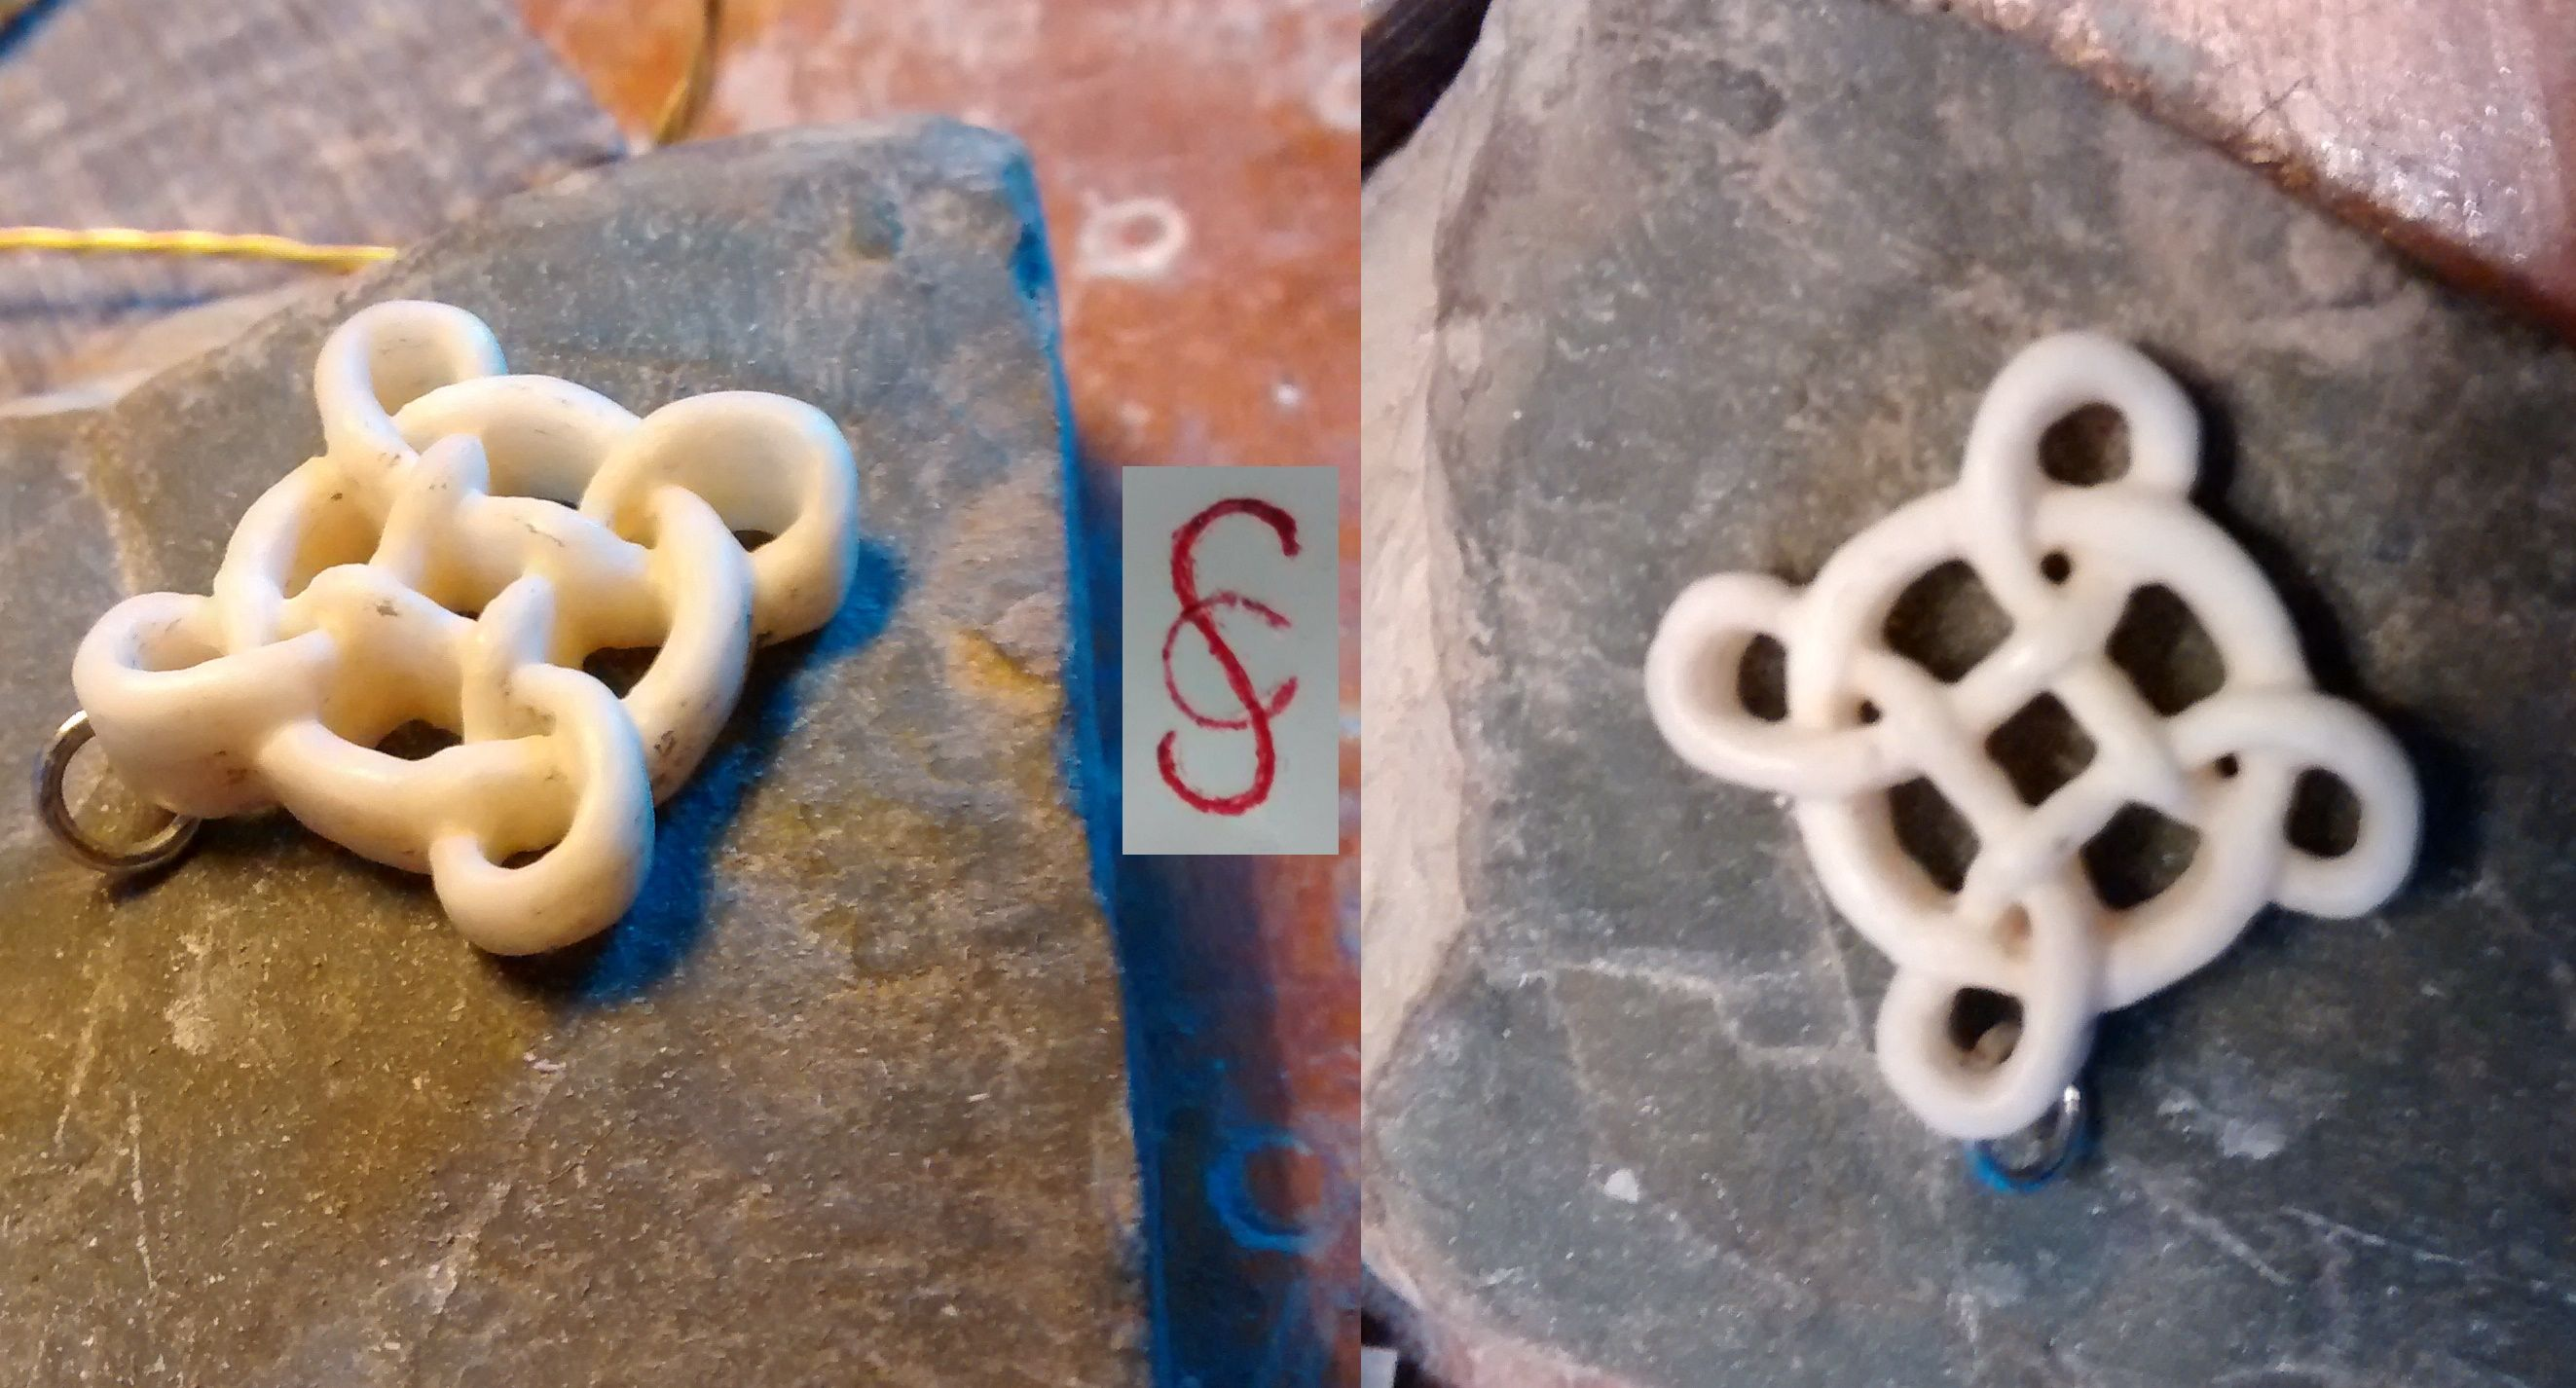 knotwork carved in bone